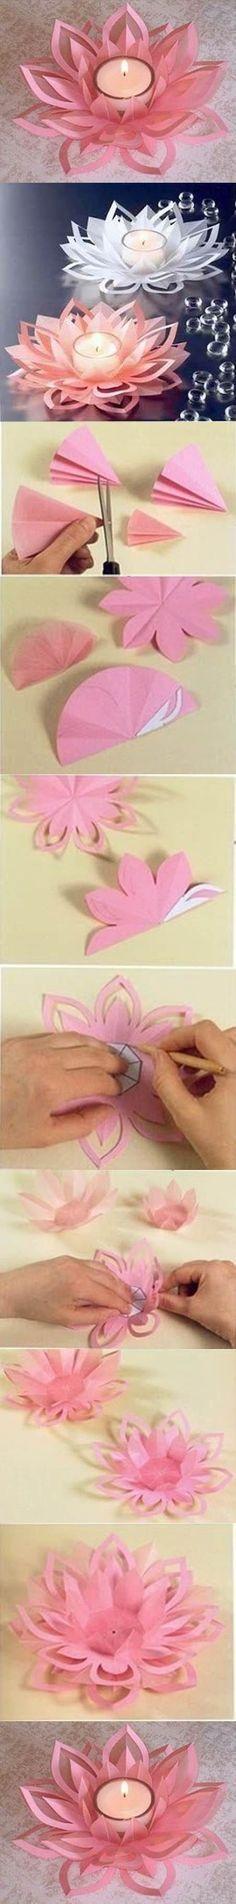 DIY Paper Lotus Candlestick 2 Wonderful DIY Beautiful Lotus Candlestick